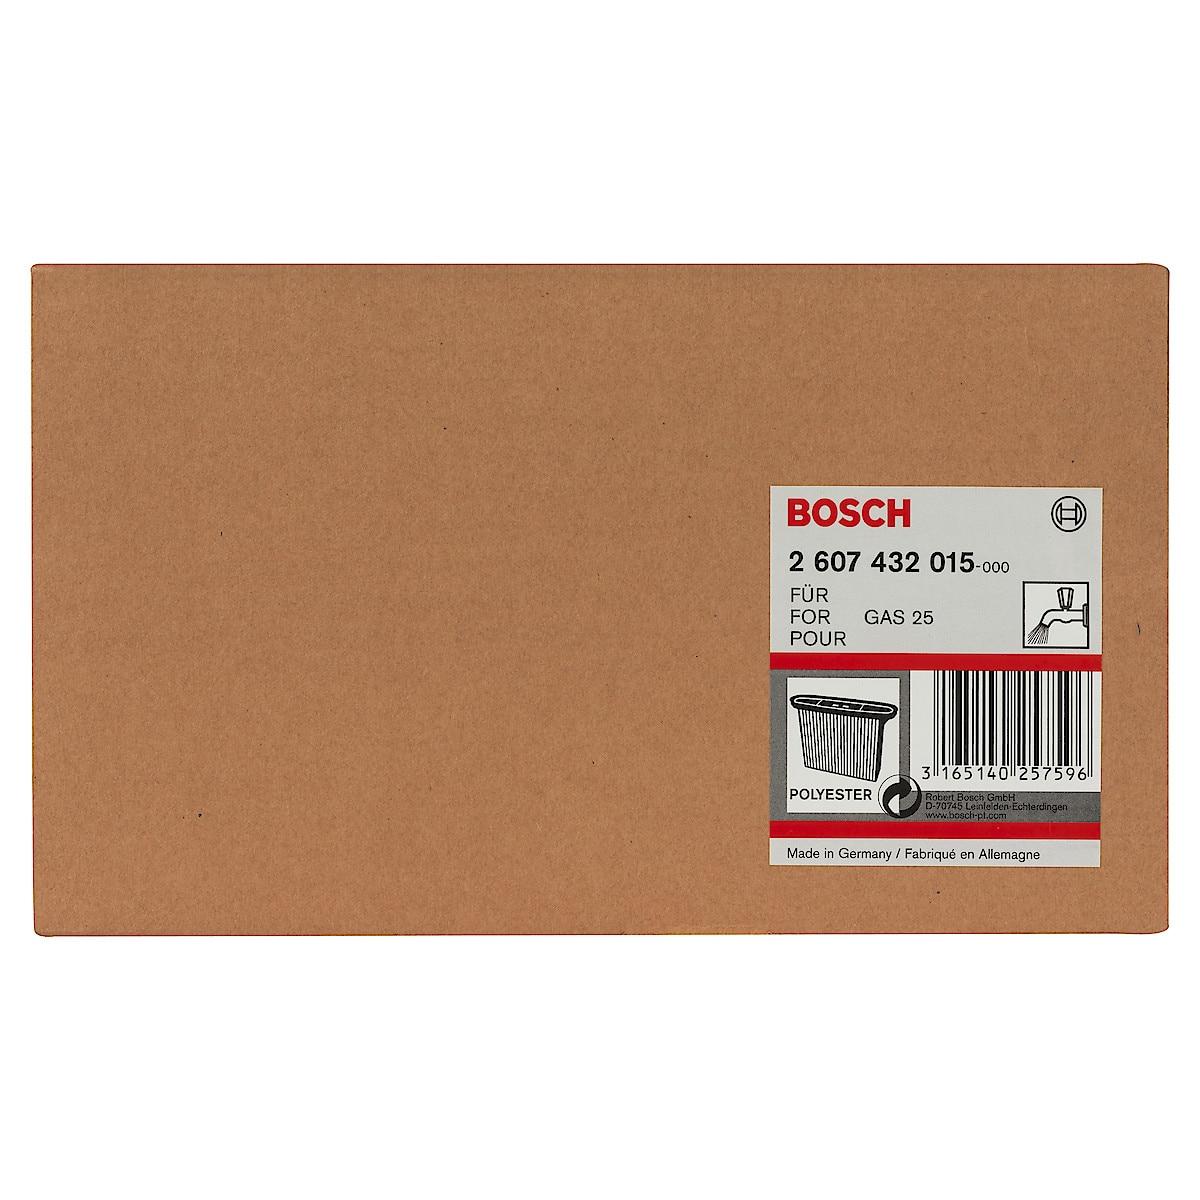 Bosch GAS 25 luftfilter